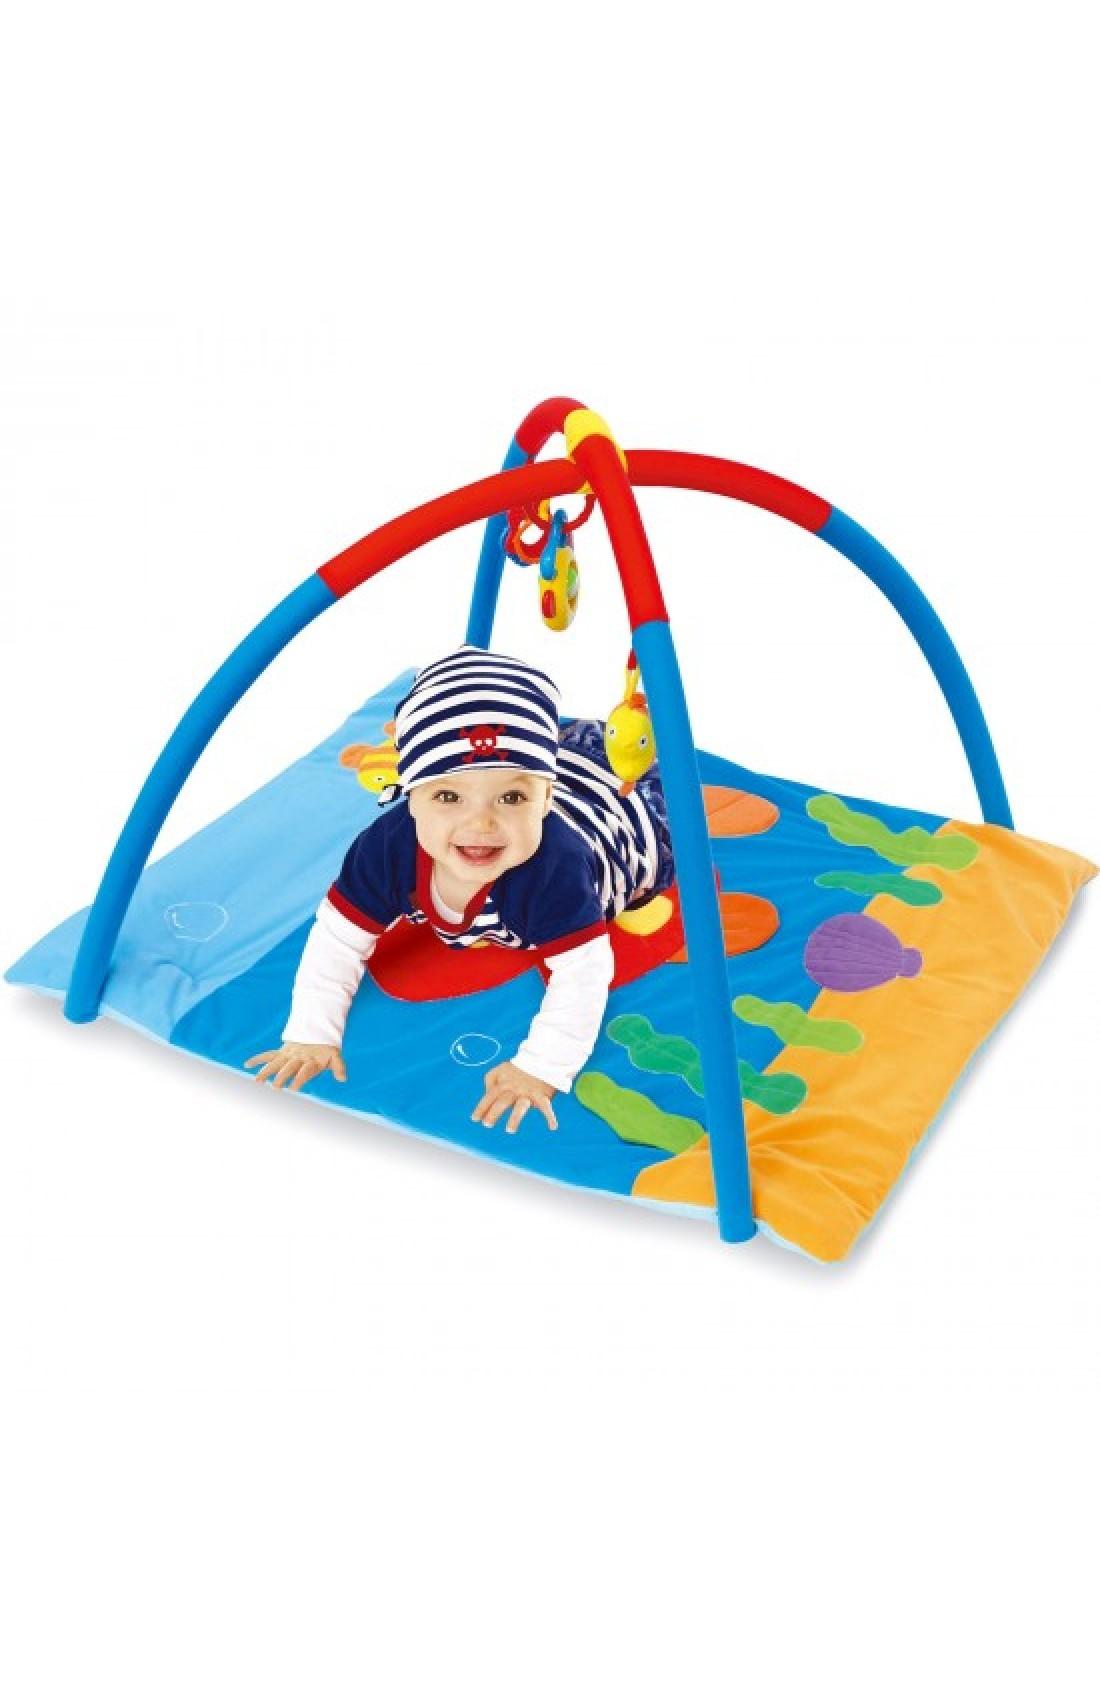 Baby Play Mat // Sea world design